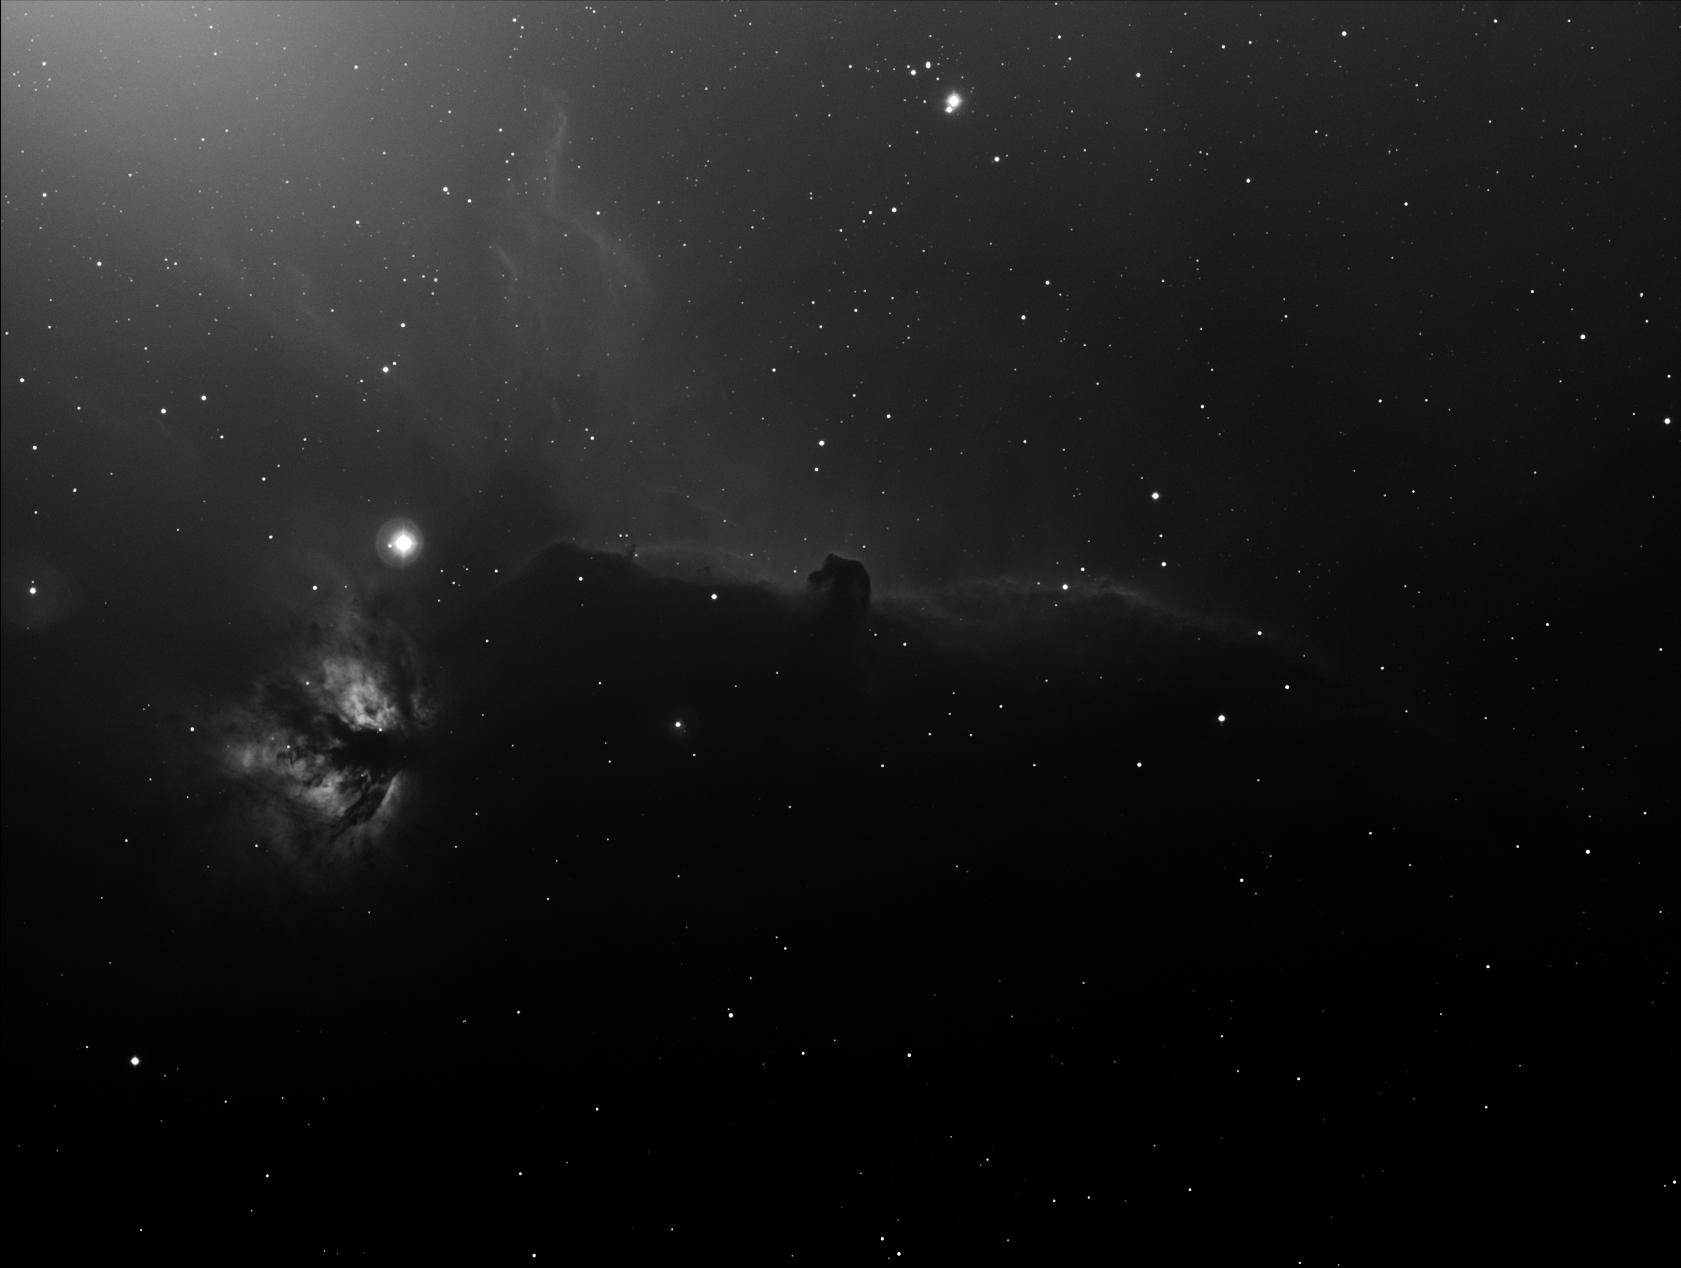 IC434 La nébuleuse de la tête de cheval - Alban BERNARD